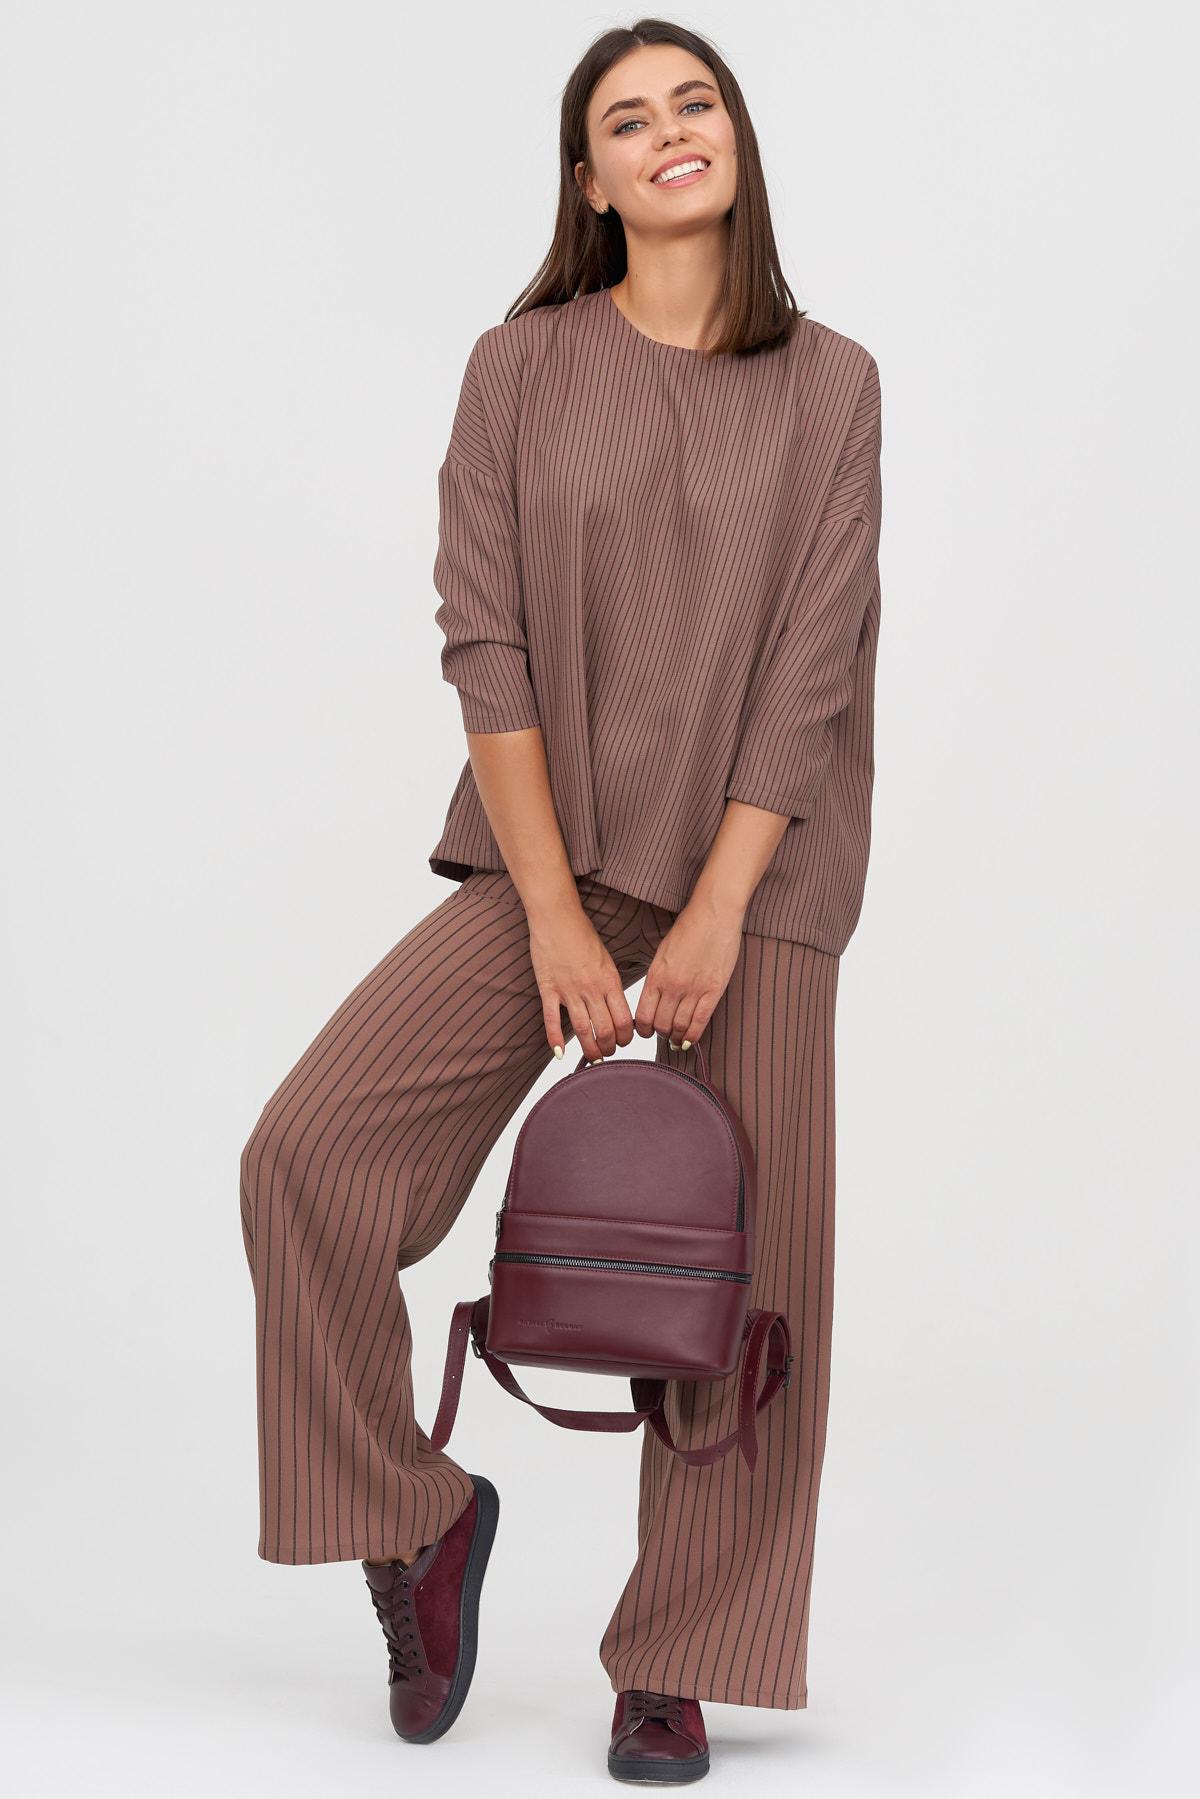 Блуза женские Natali Bolgar модель 19067KR144 характеристики, 2017